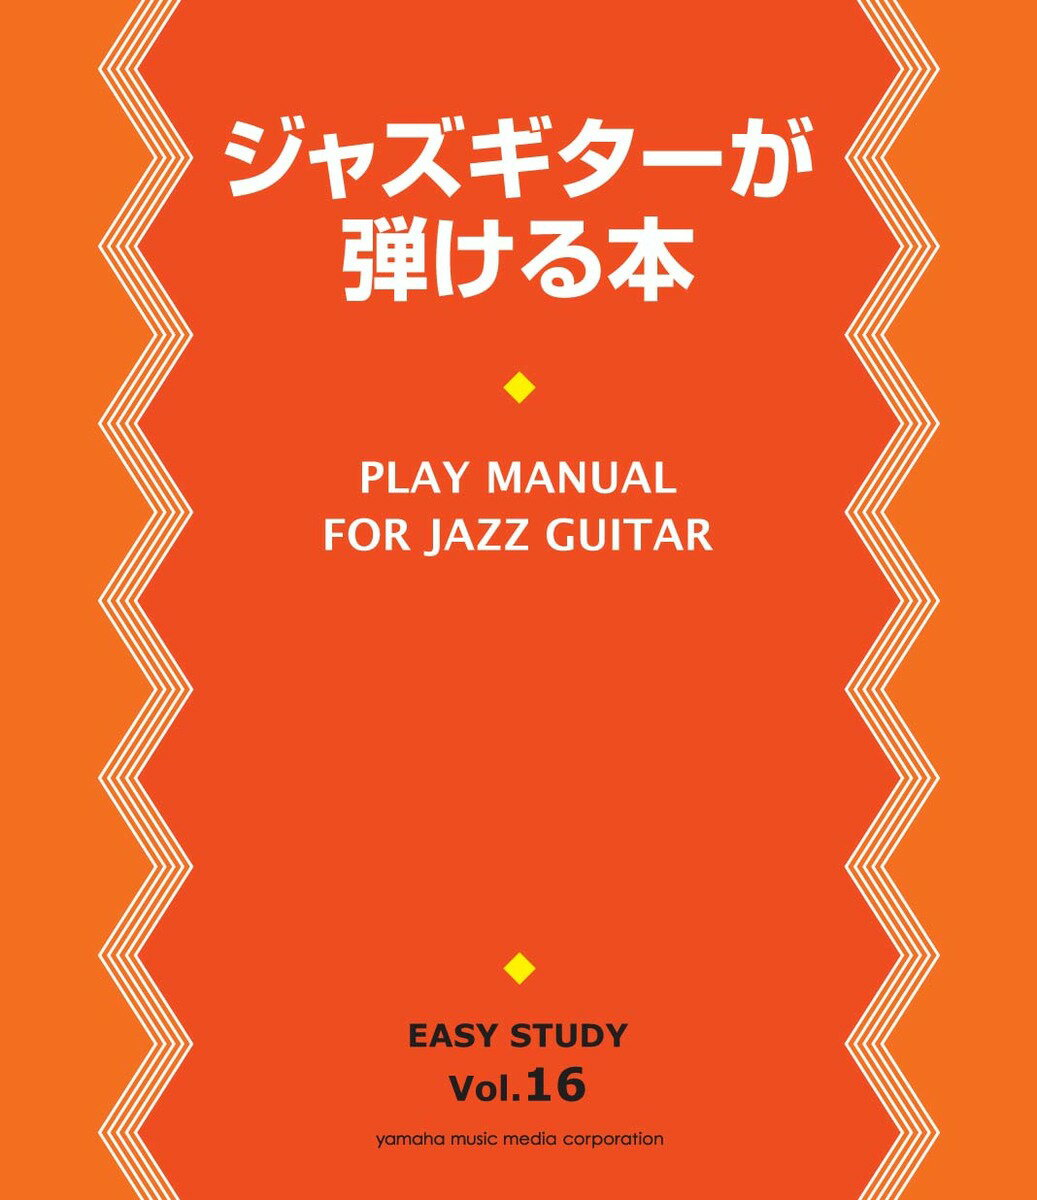 EASY STUDY ジャズギターが弾ける本